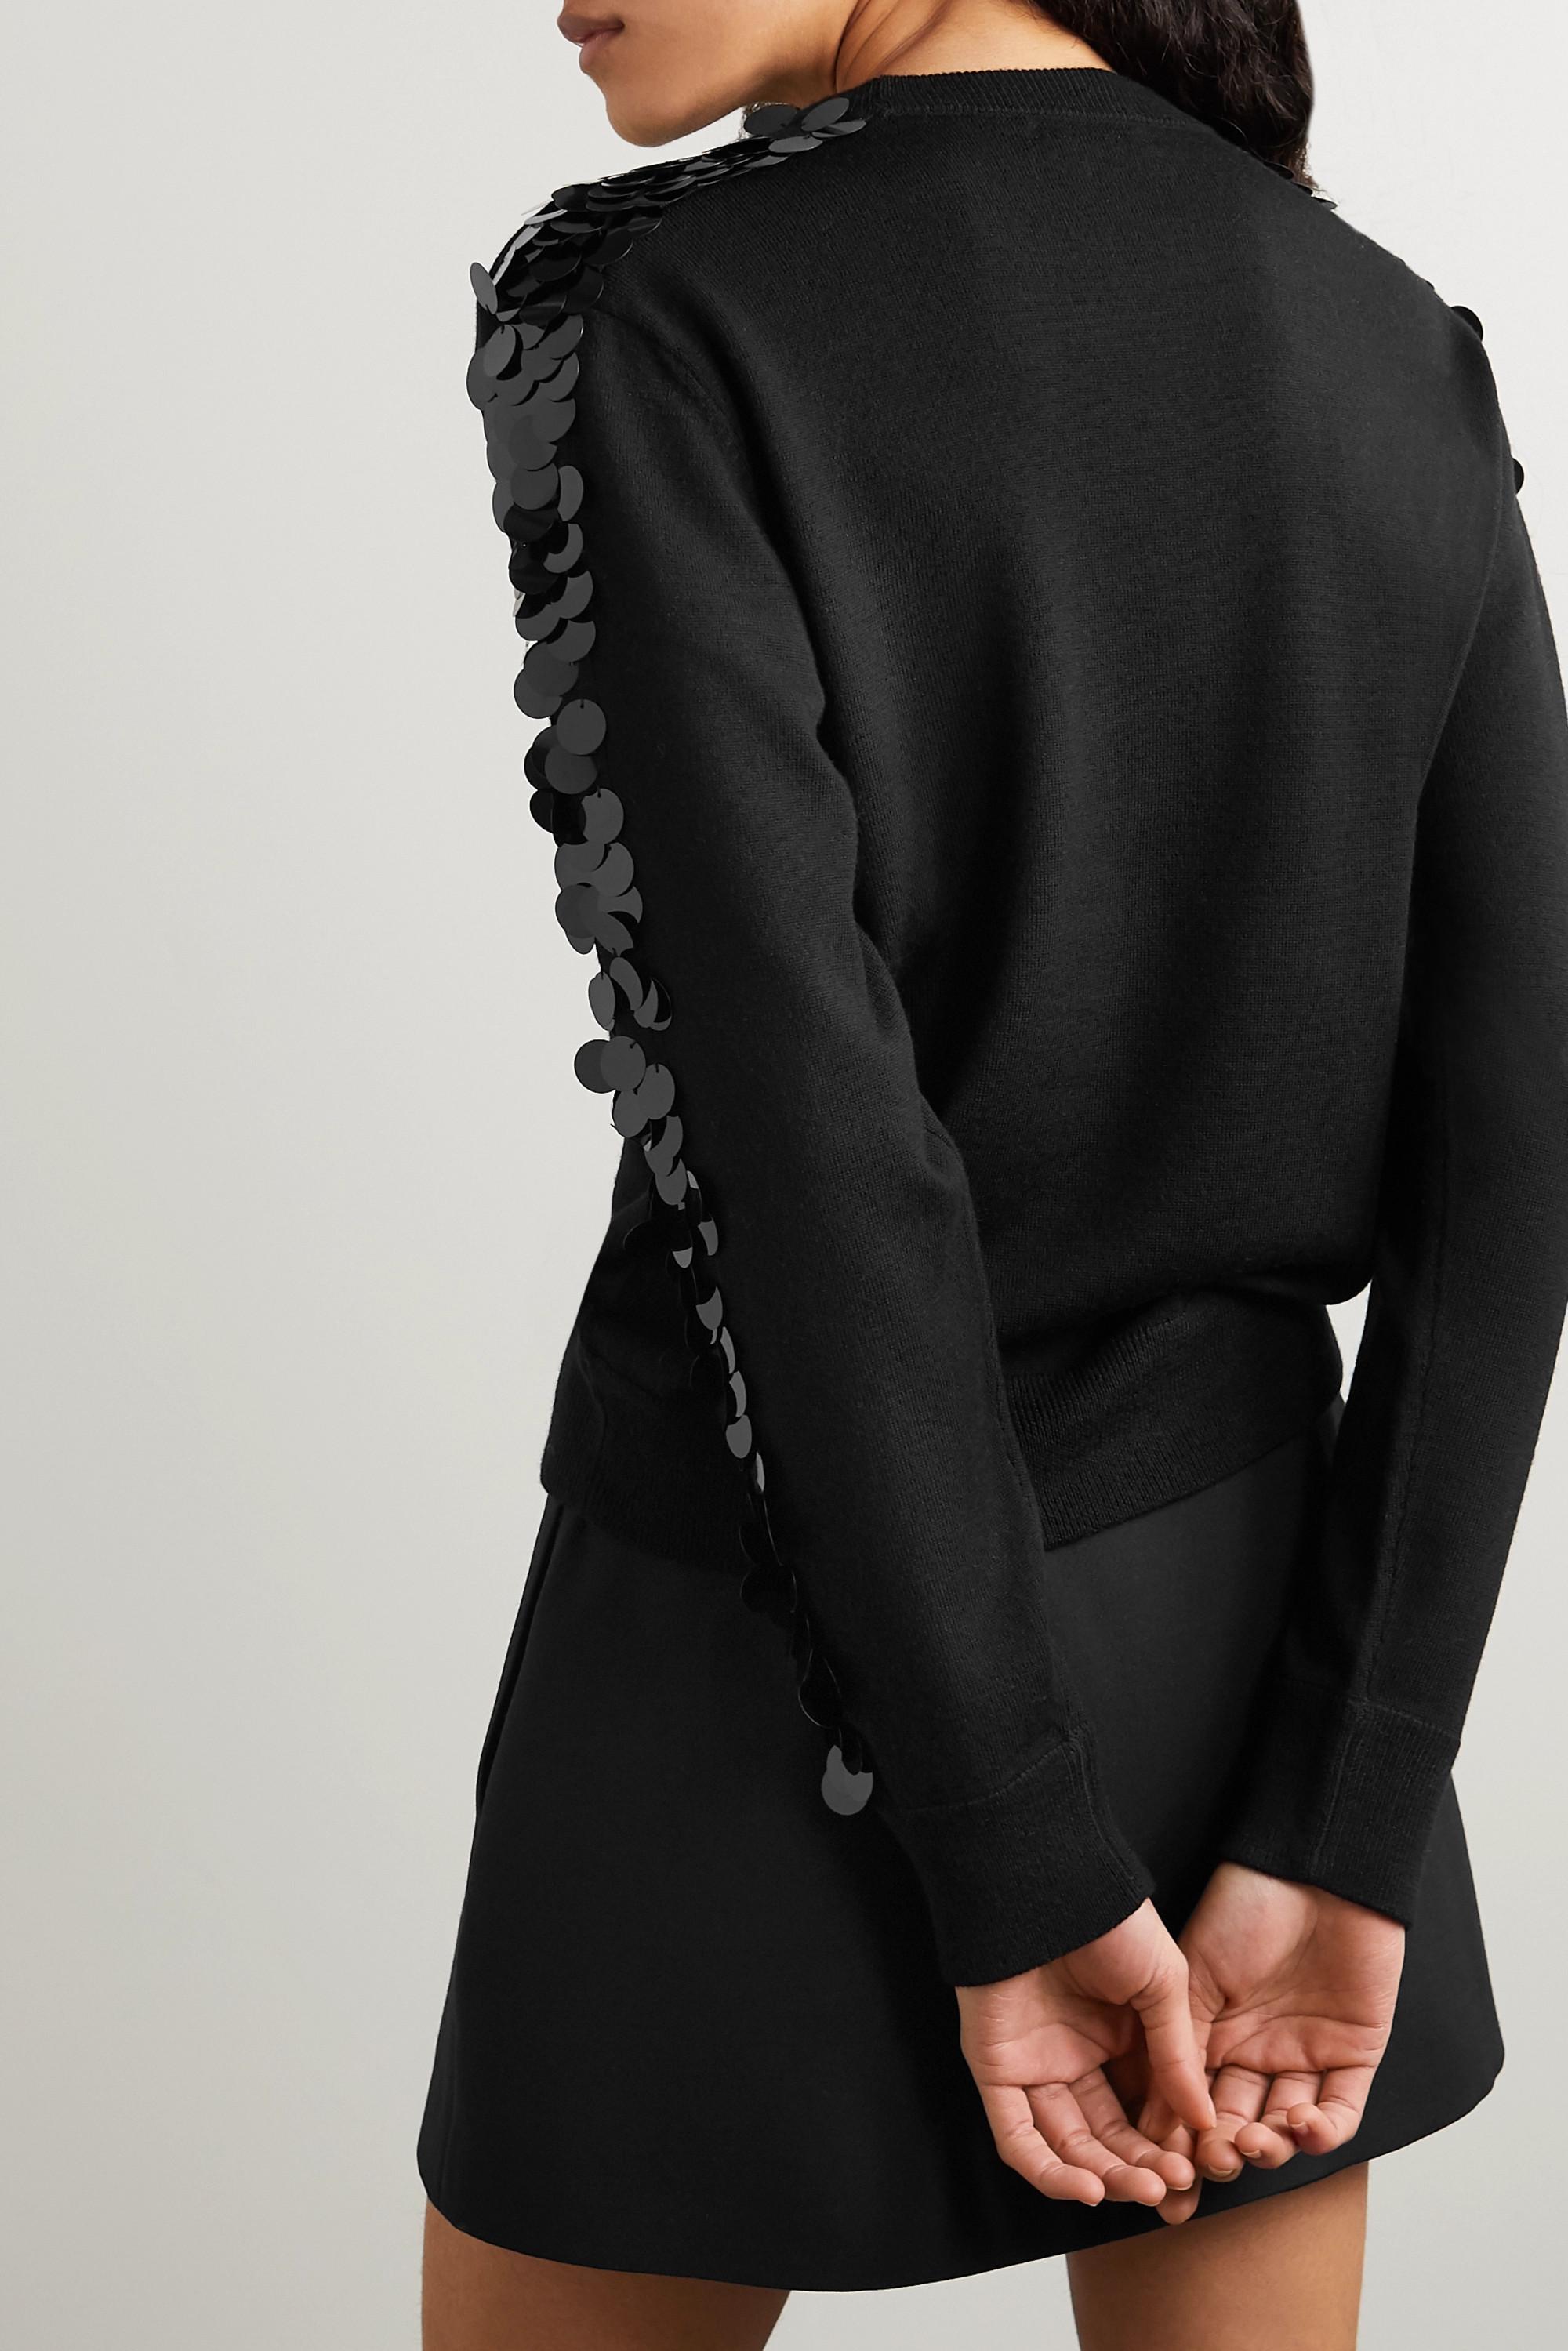 Bella Freud Lady Day paillette-embellished wool sweater